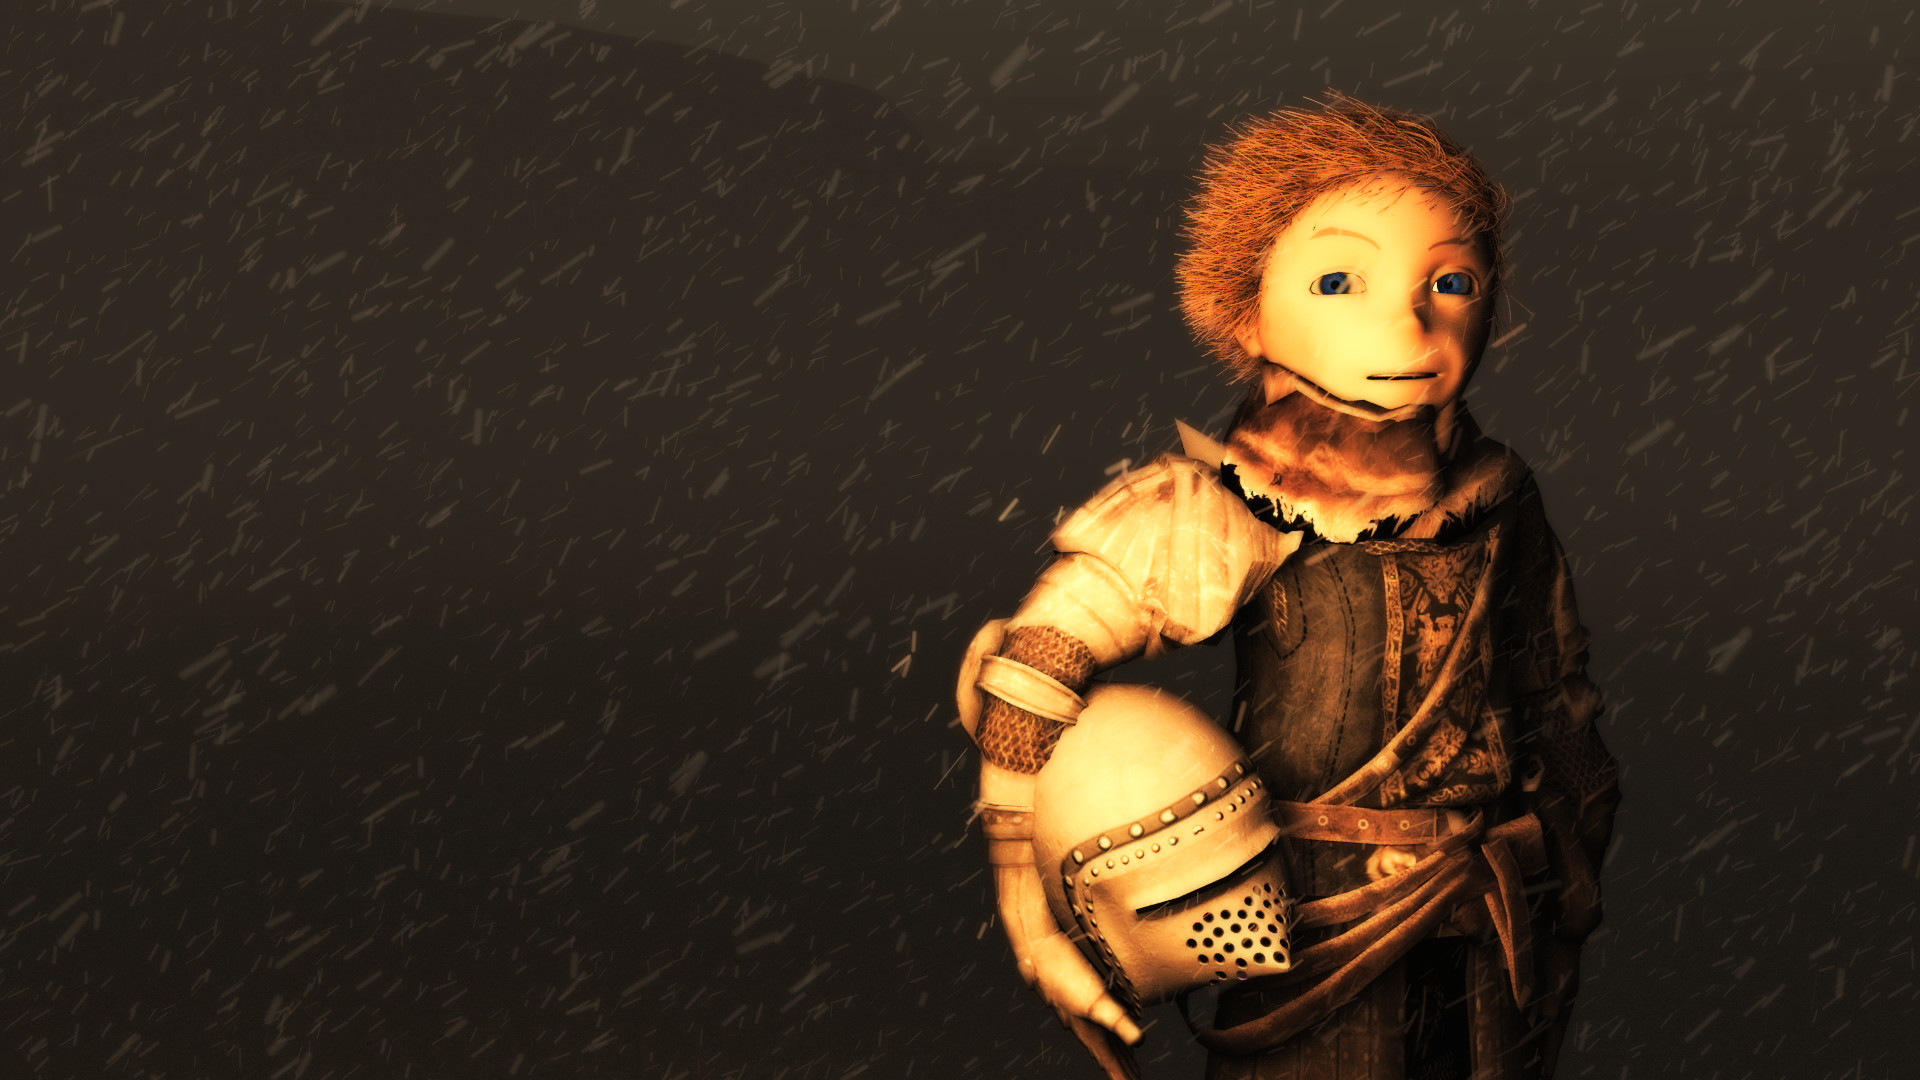 medieval, Knights, Helmet, Armor, Snow, Wind, Storm, Animation,